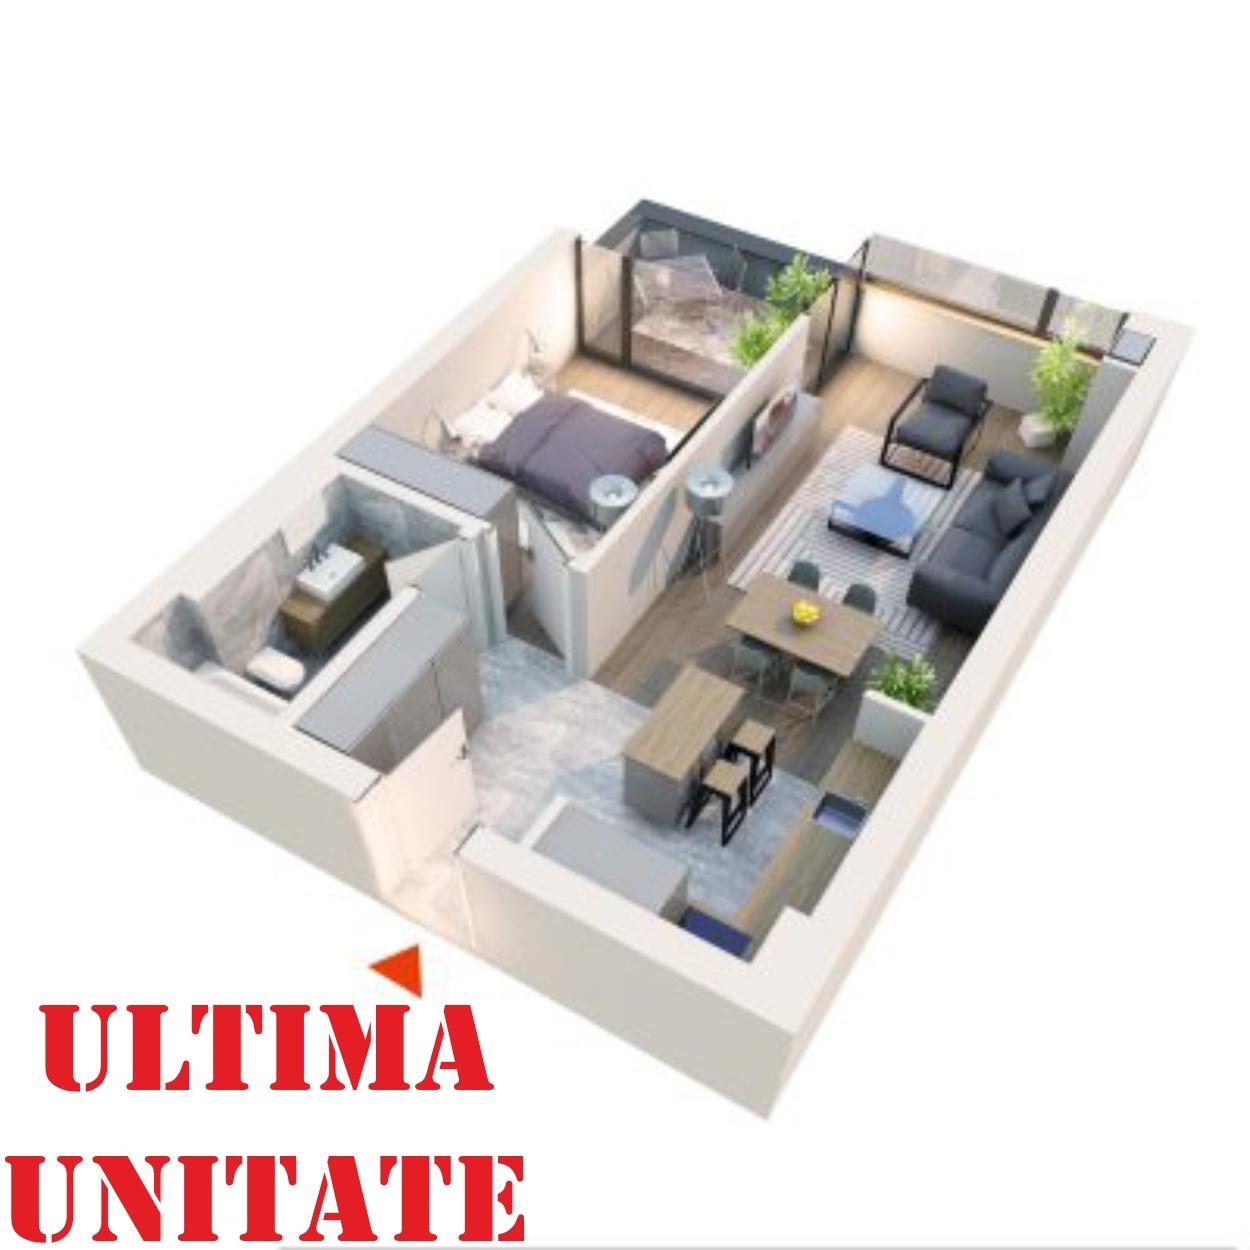 "Apartament 2 camere tip 2D1.1"" Logie | Etaj 1 | Corp C7 | Faza 2"